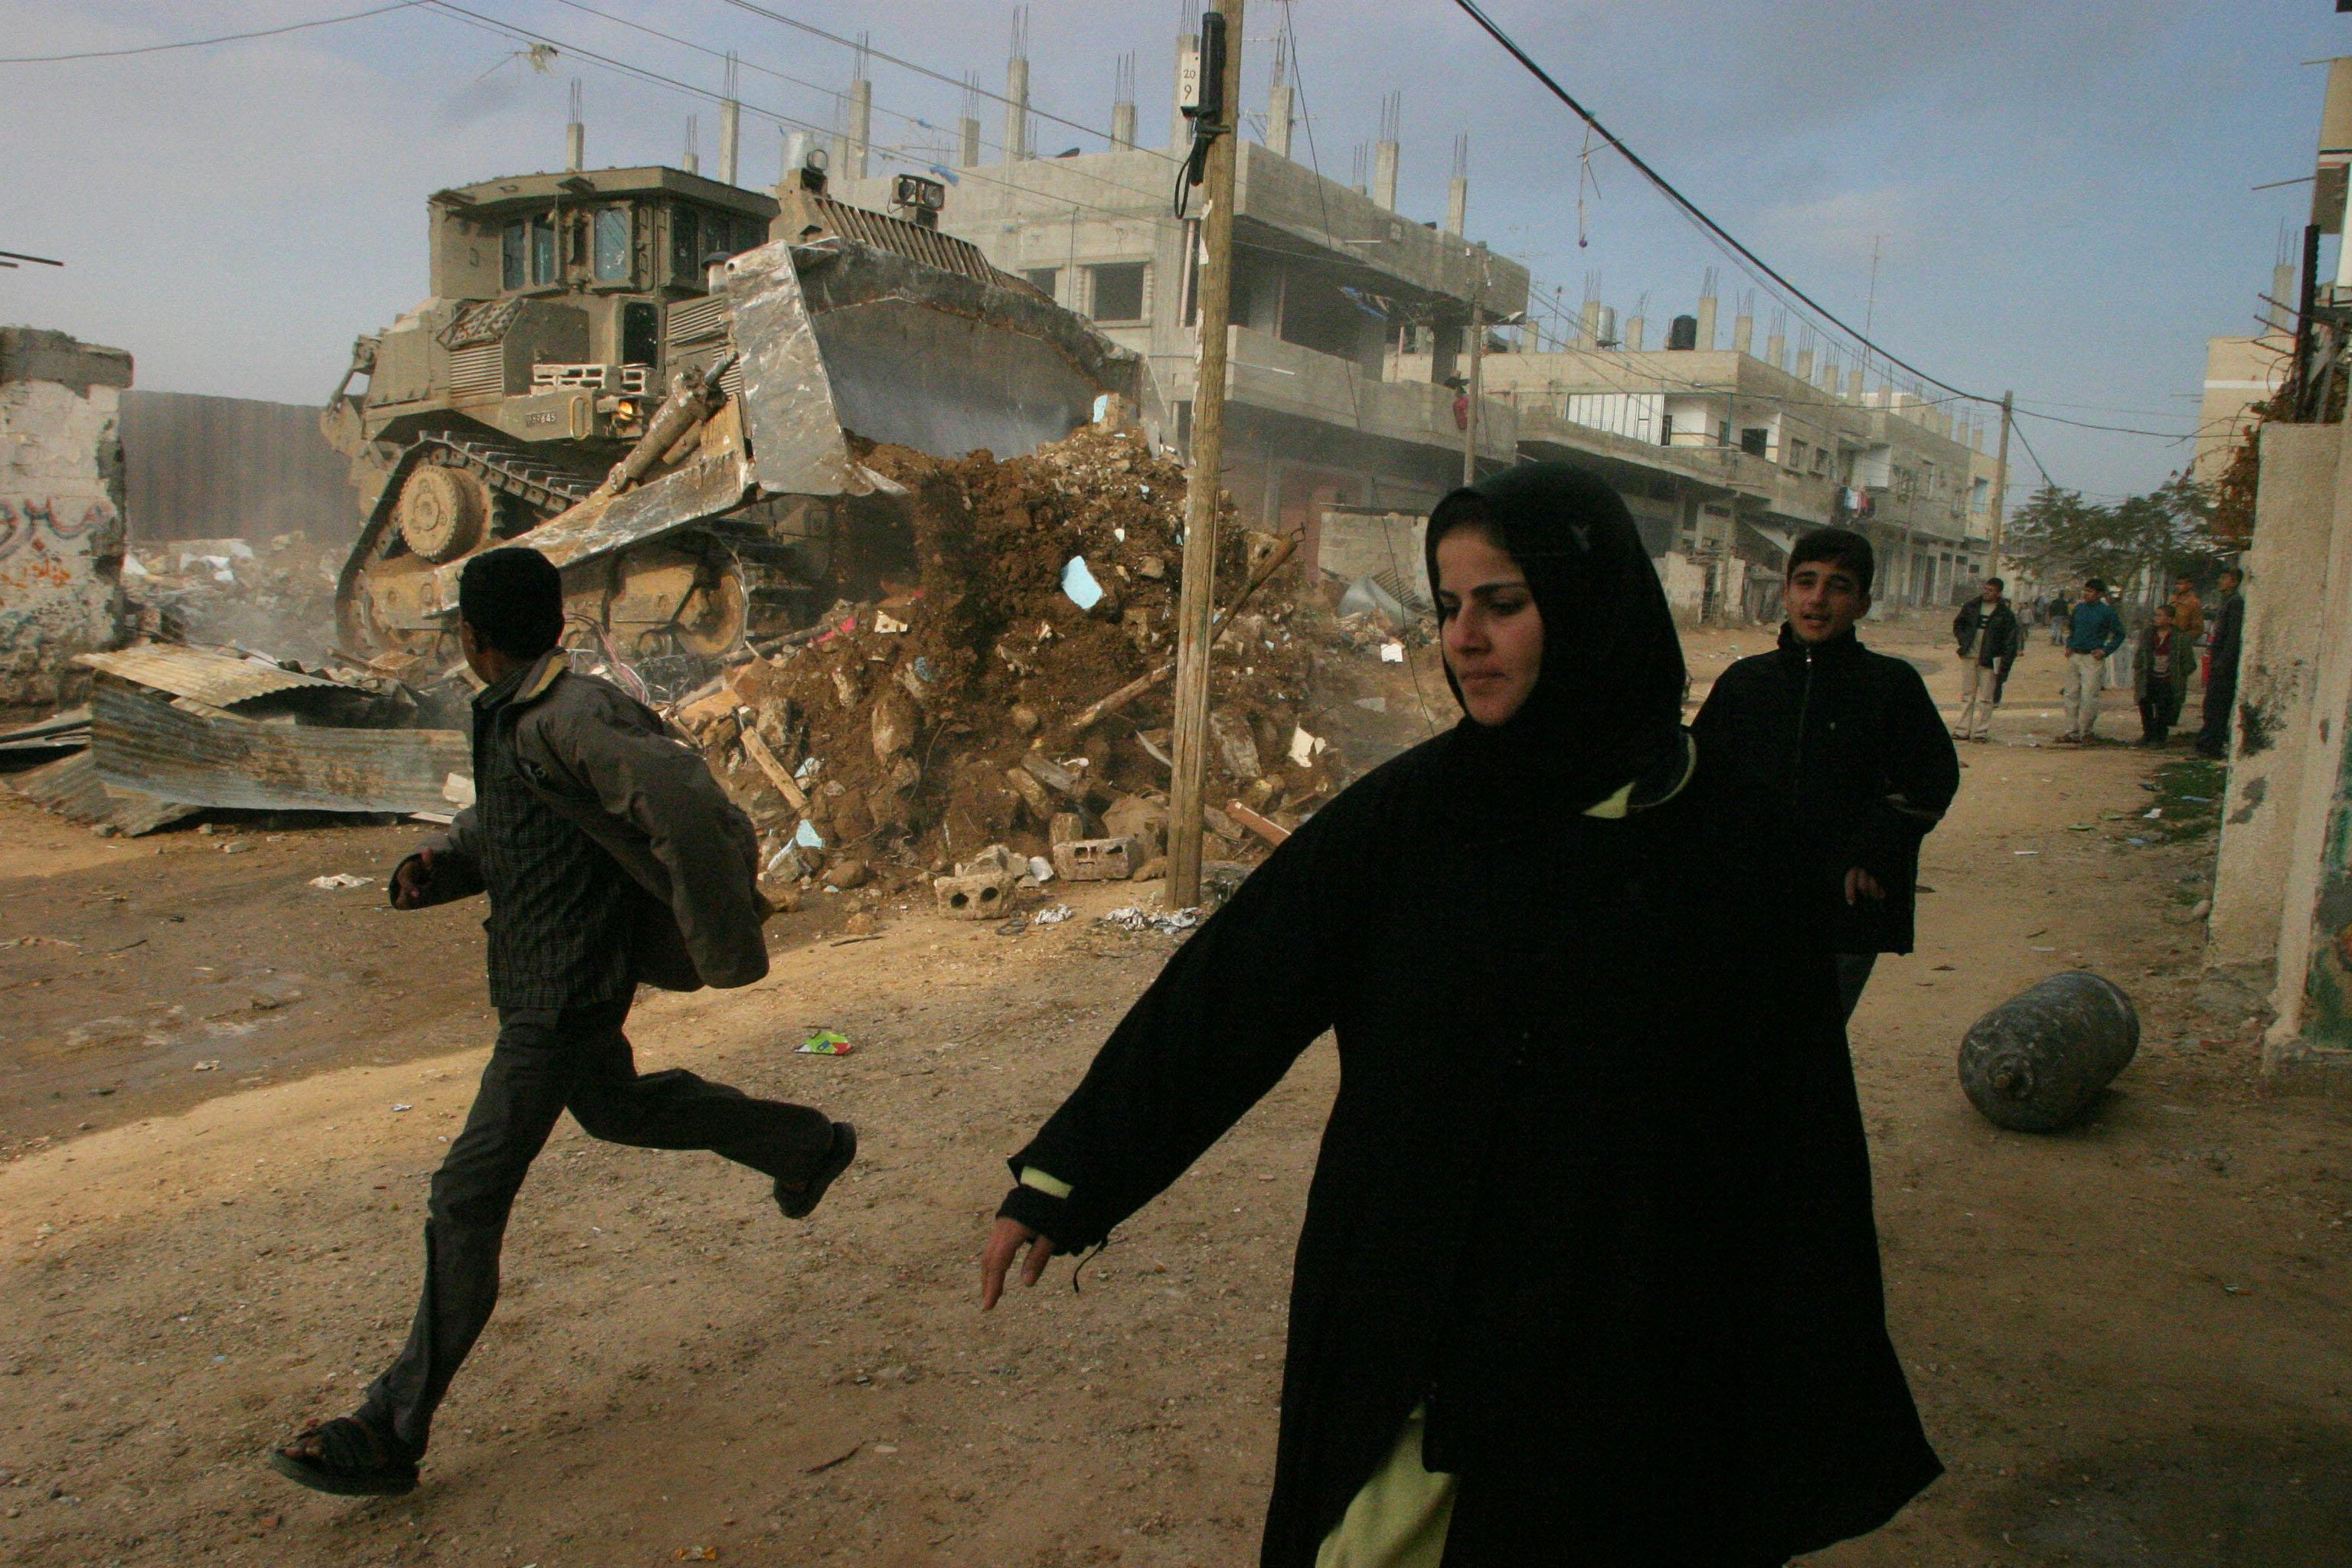 https://www.peacenotprofit.org/activistimages/gallery/Armored%20Bulldozer%20Destroys%20Palestinian%20Home.jpg